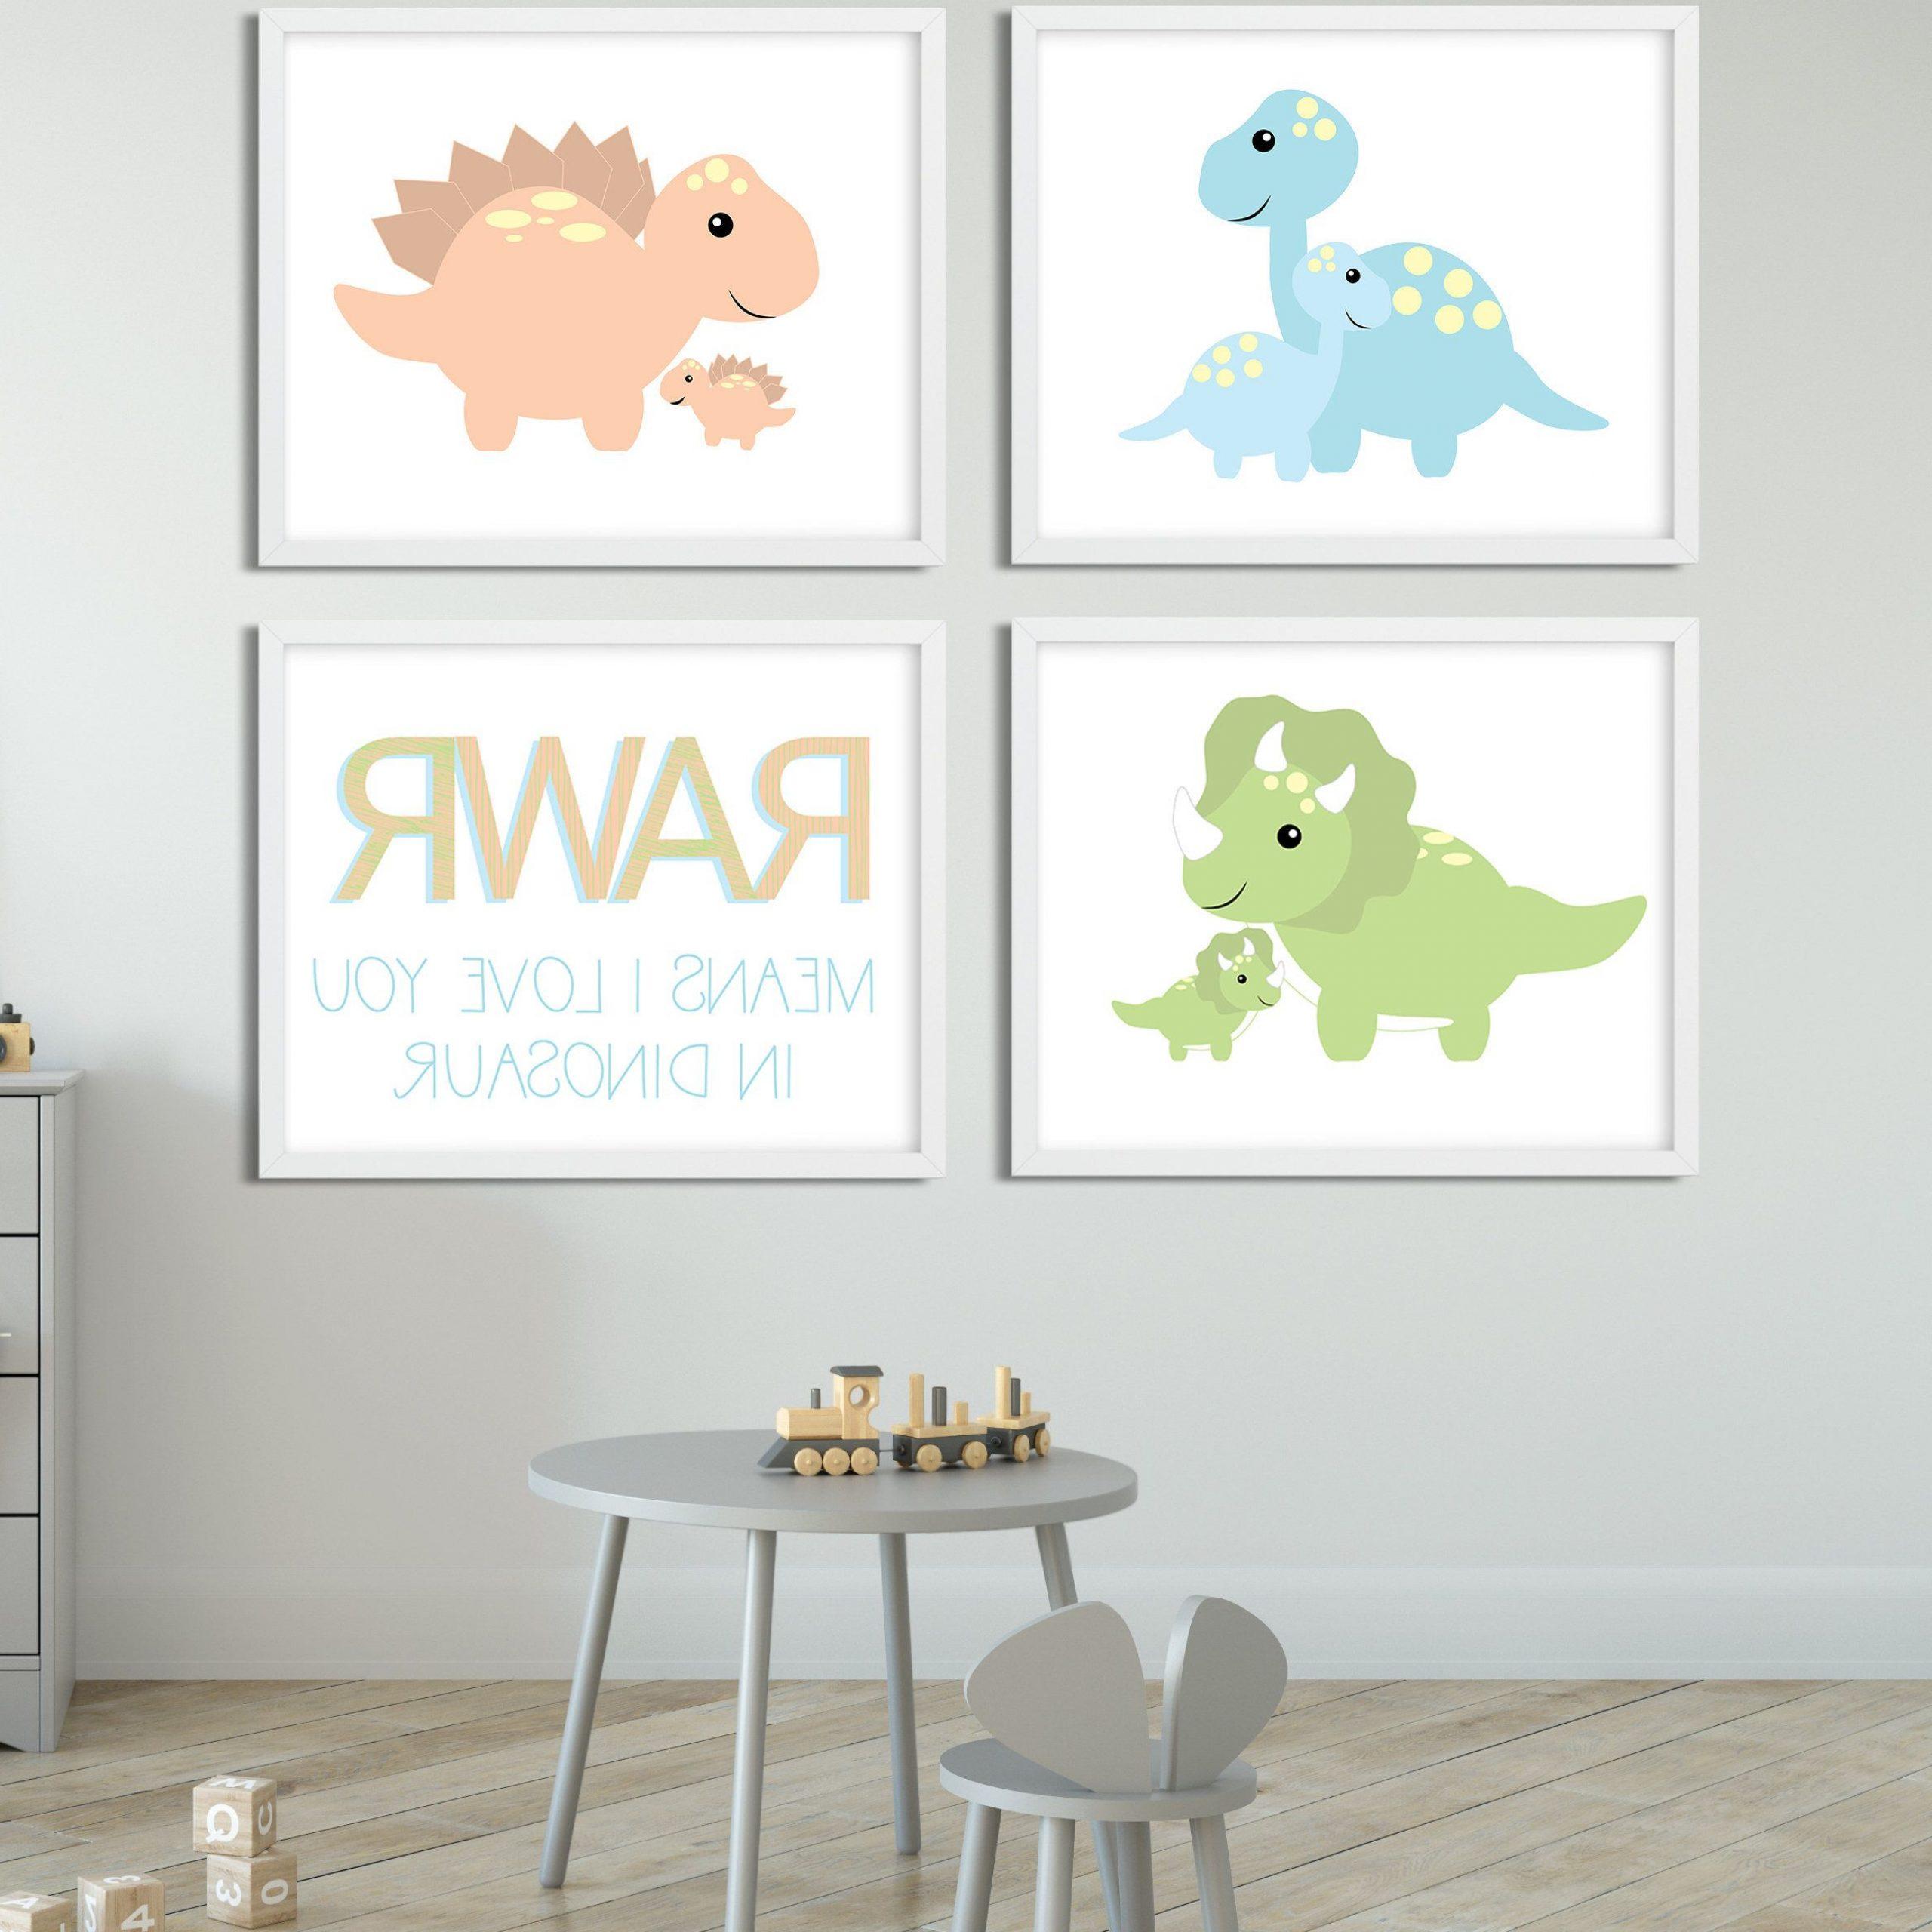 Recent Blended Fabric Mod Dinosaur 3 Piece Wall Hangings Set For Dinosaur Nursery Dinosaur Art Dinosaur Nursery Ideas (View 13 of 20)